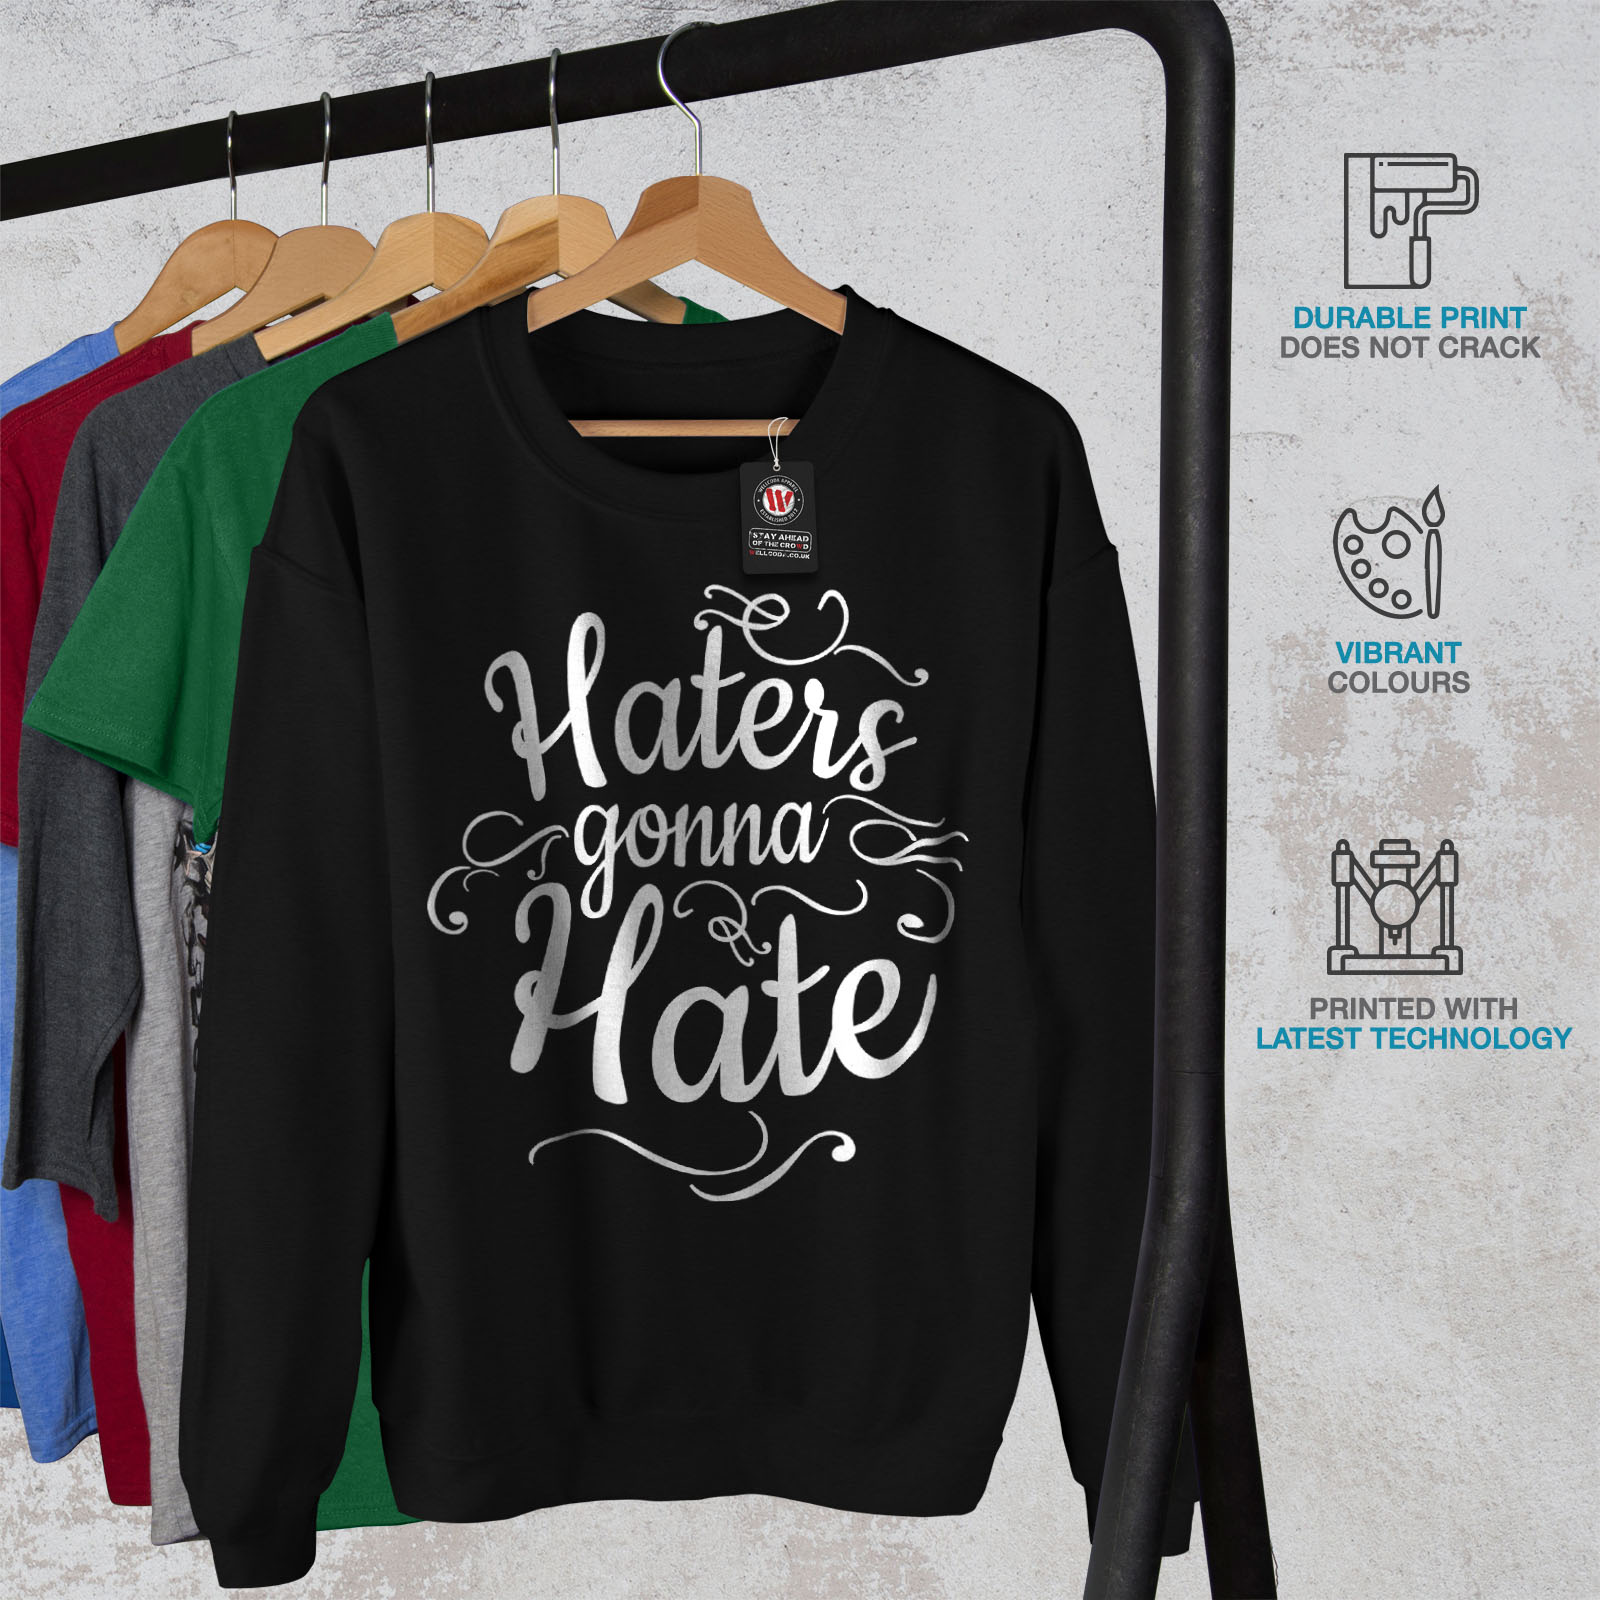 pullover pullover Haters nero Hate Wellcoda Gonna casual Mens divertente Sweatshirt w8Xwq7x